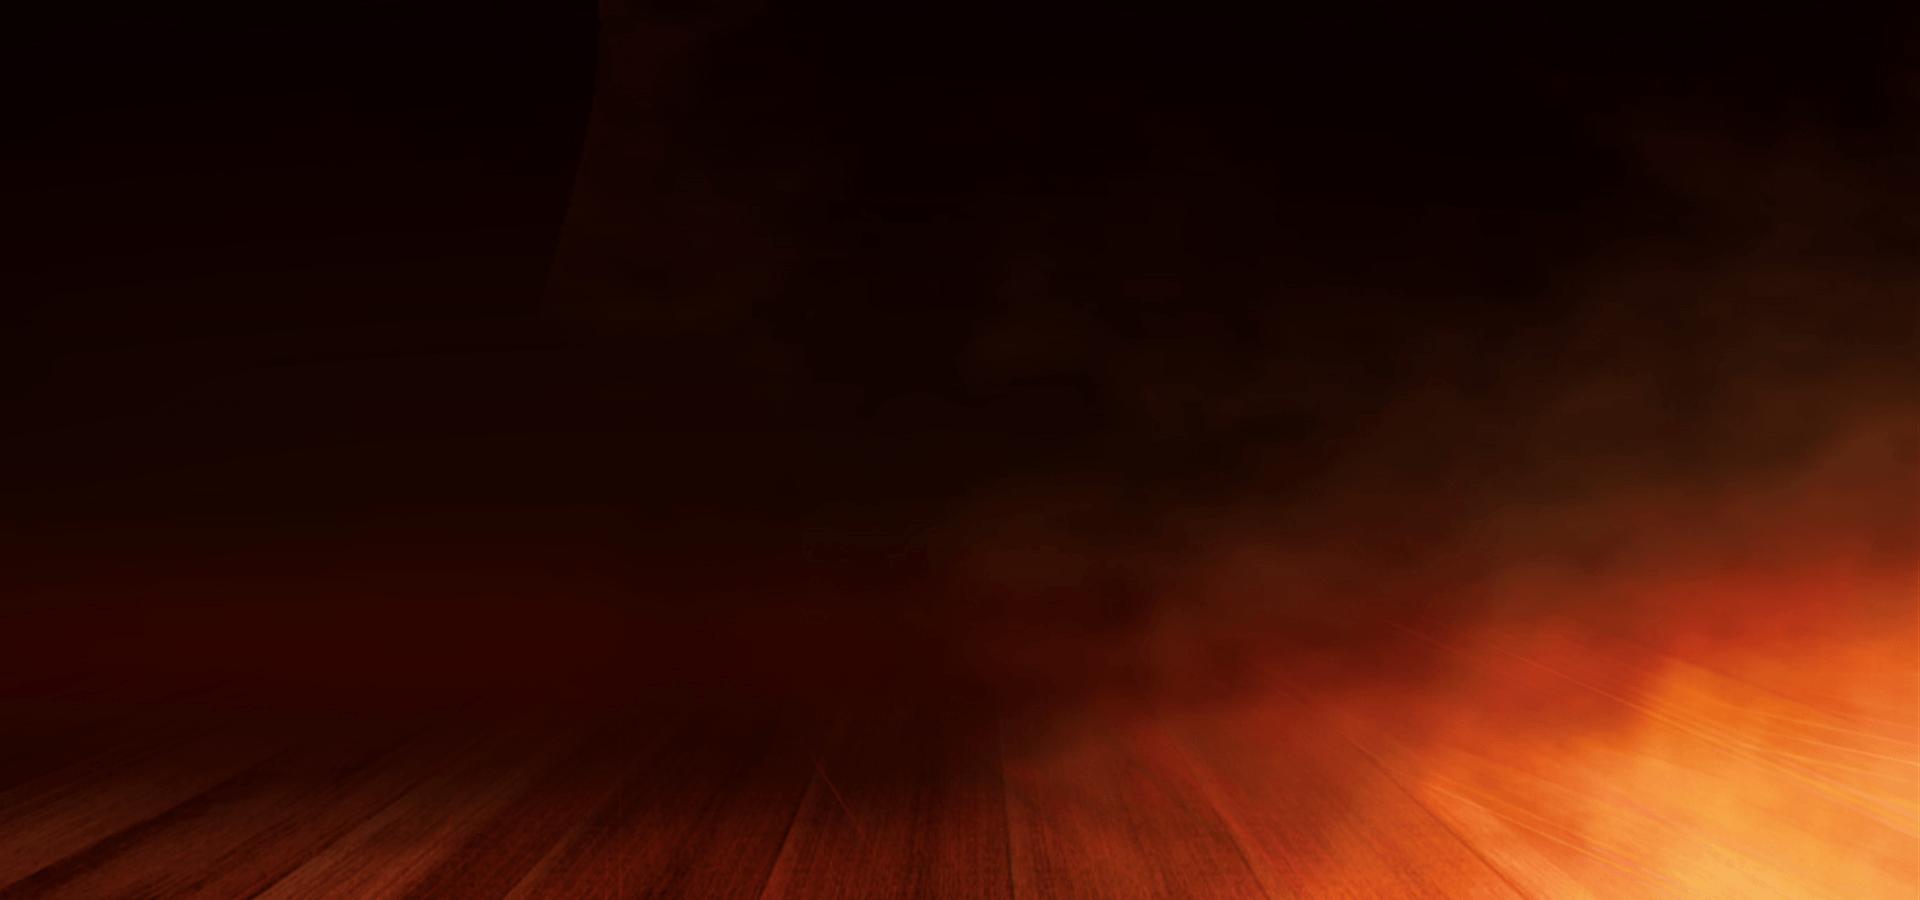 Music's Greatest Mysteries – Season 1 Digital Exclusives